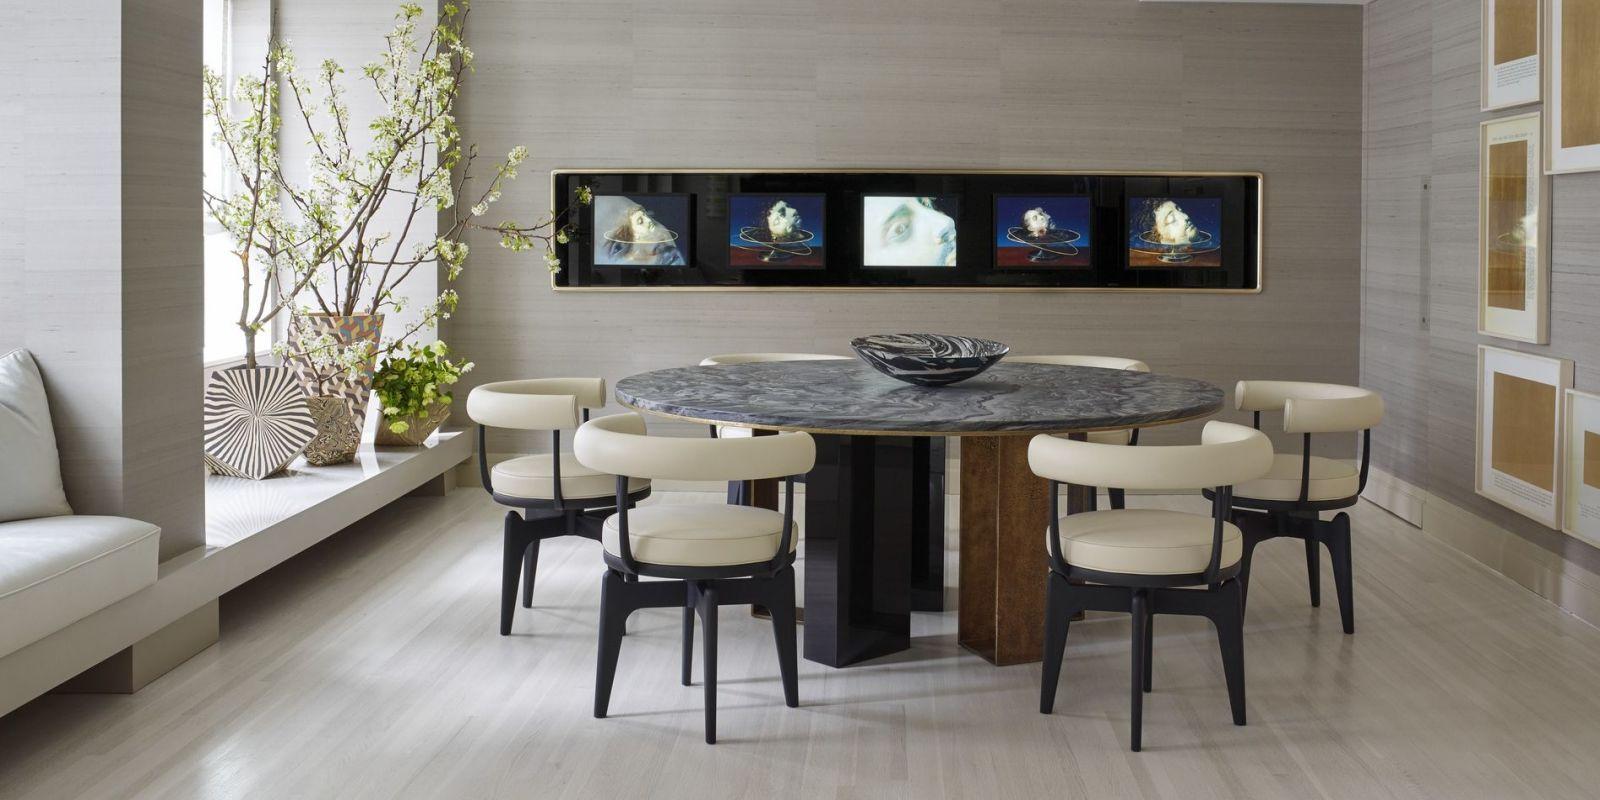 25 modern dining room decorating ideas contemporary dining room rh elledecor com contemporary small dining room design dining room decor contemporary